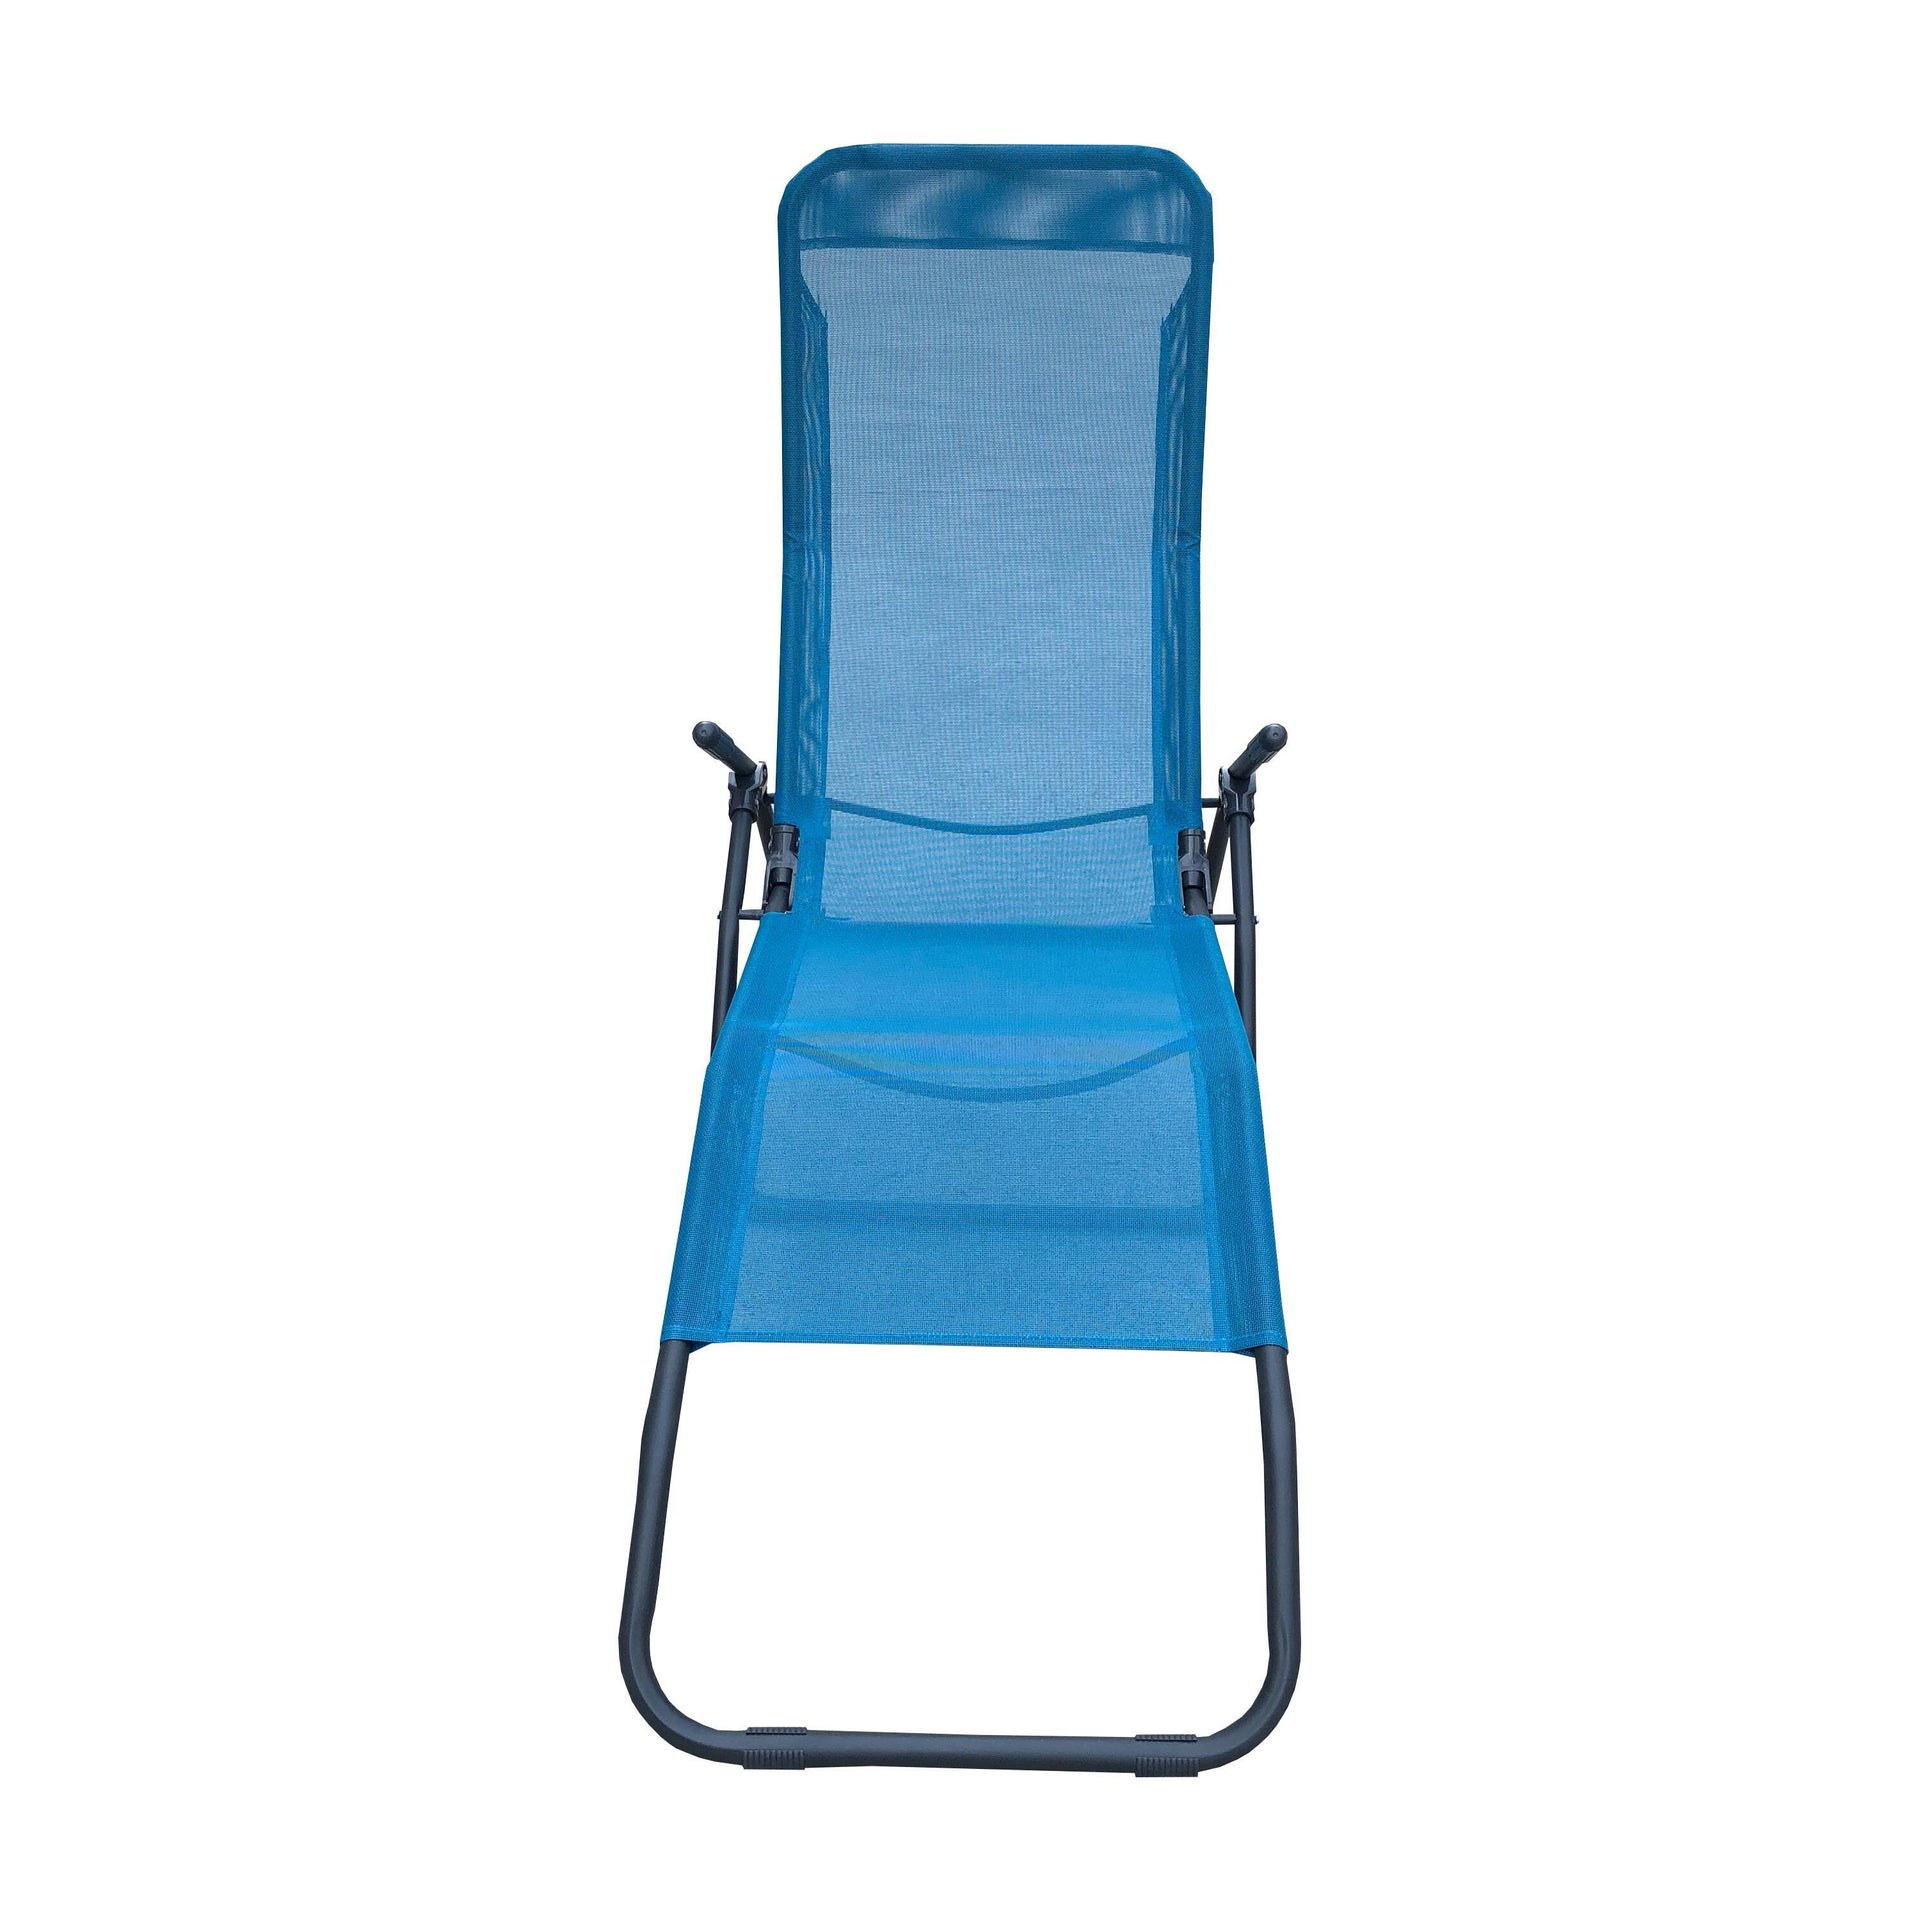 Lettino senza cuscino Fiesta in acciaio blu - 4